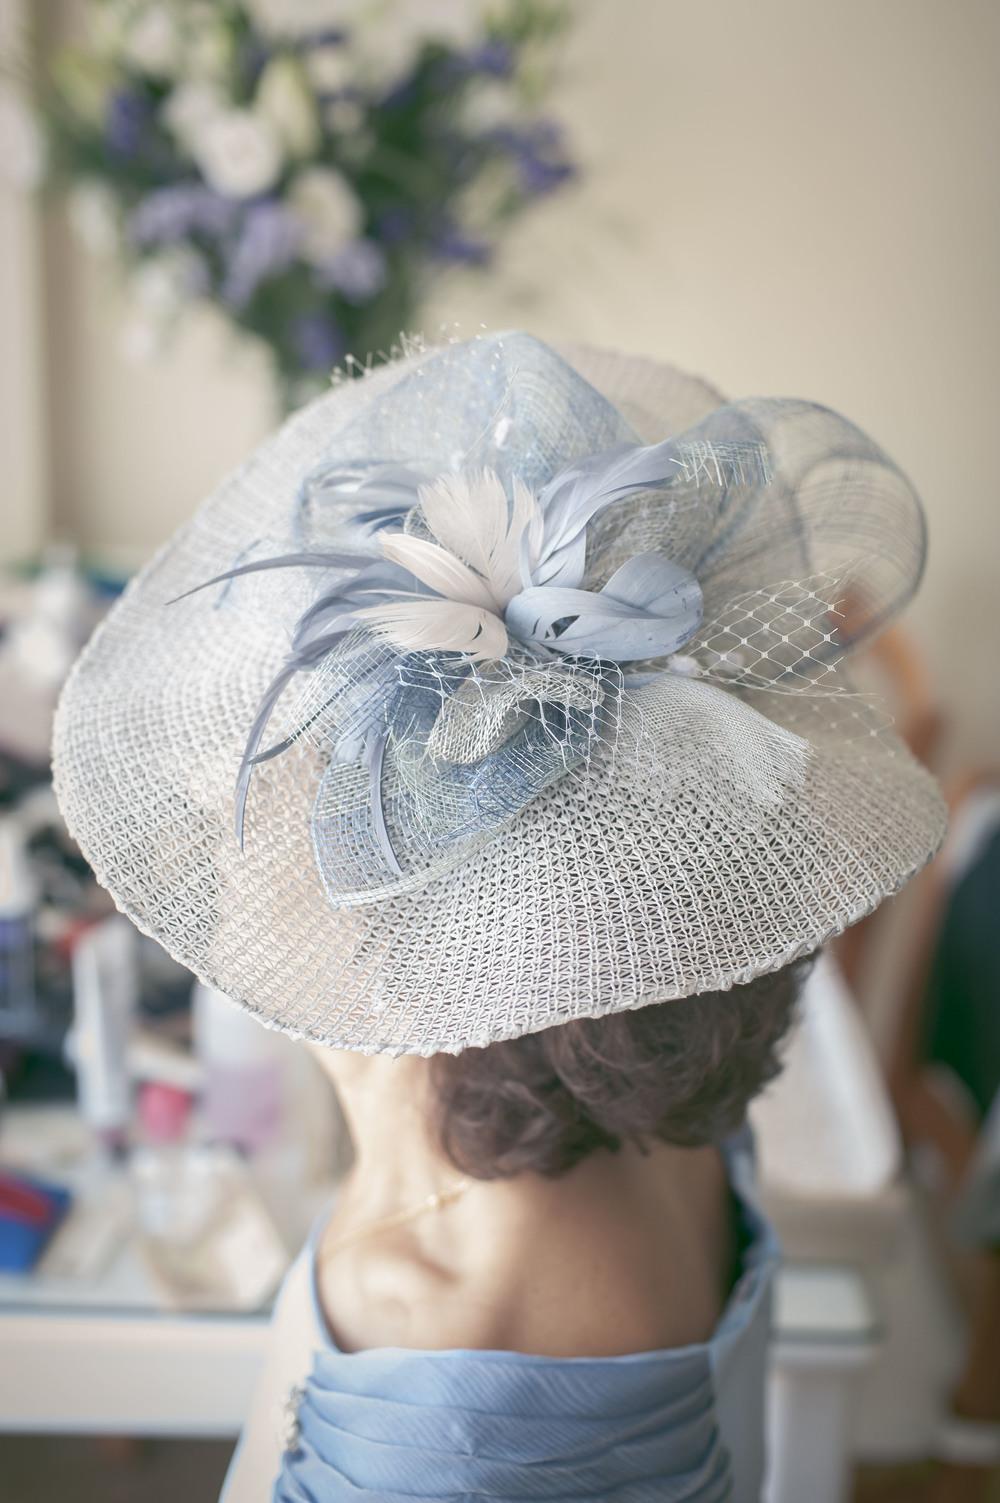 Teo-vestido-azul-angeles-serrano.jpg